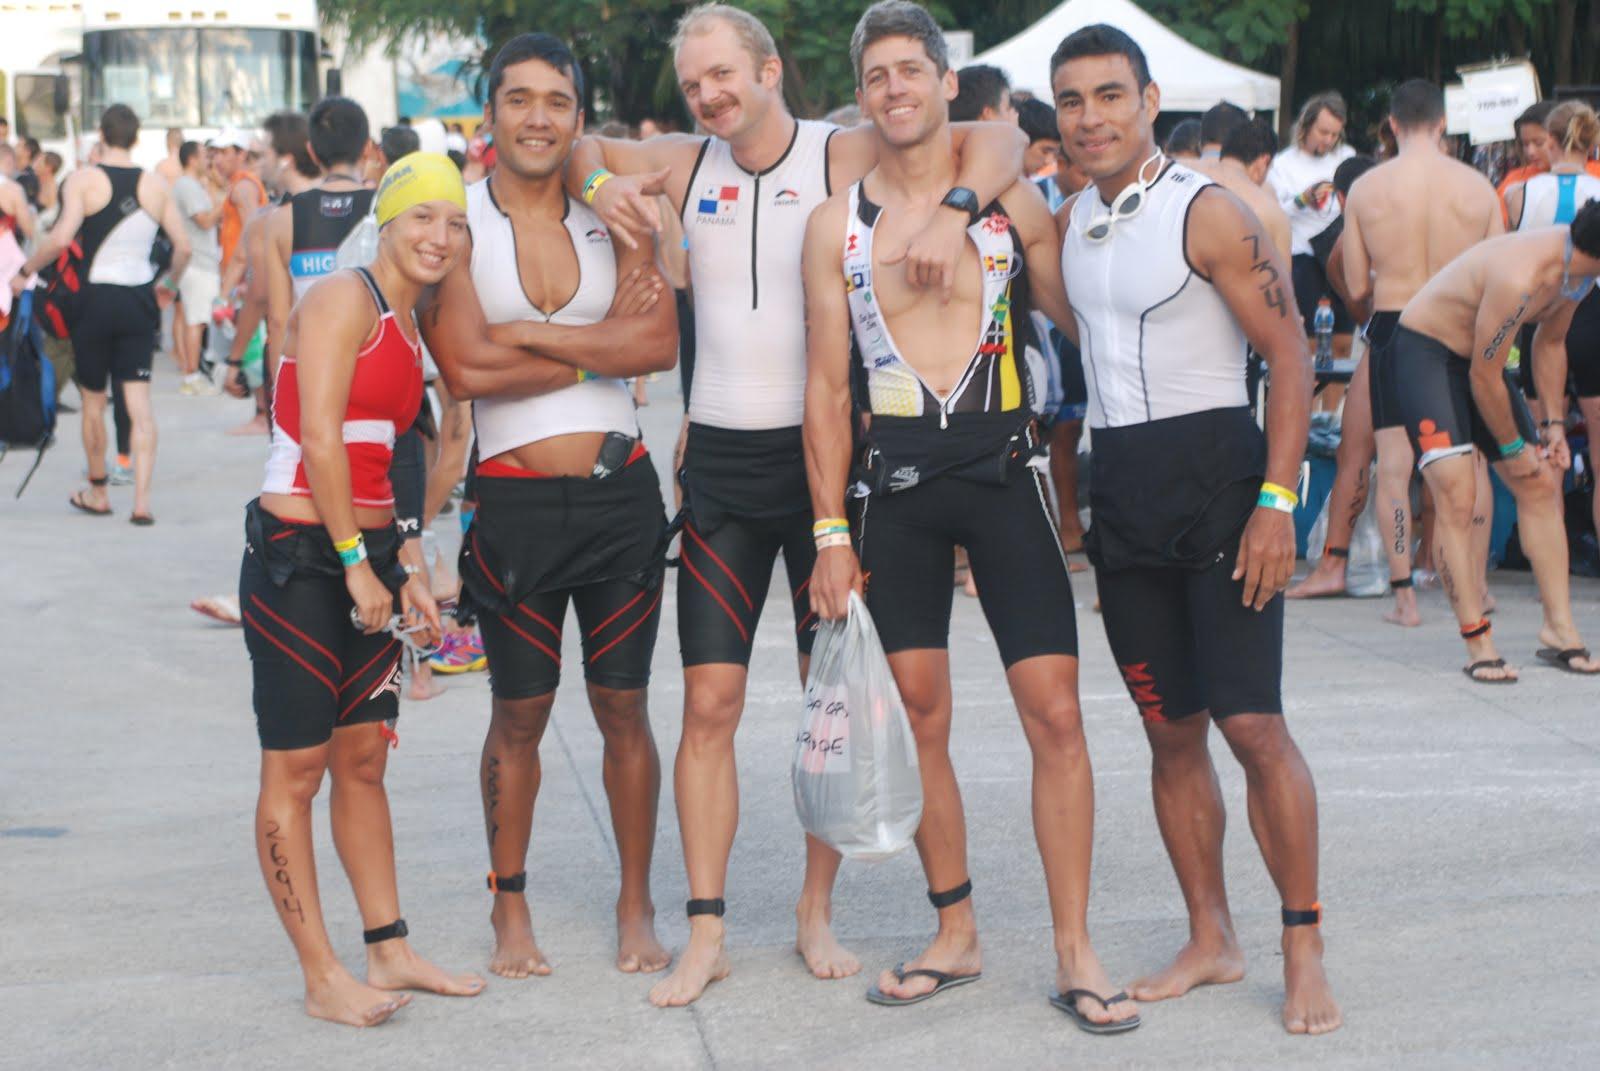 Triatlon pruebas combinadas ironman cozumel 2012 for Gimnasio kine